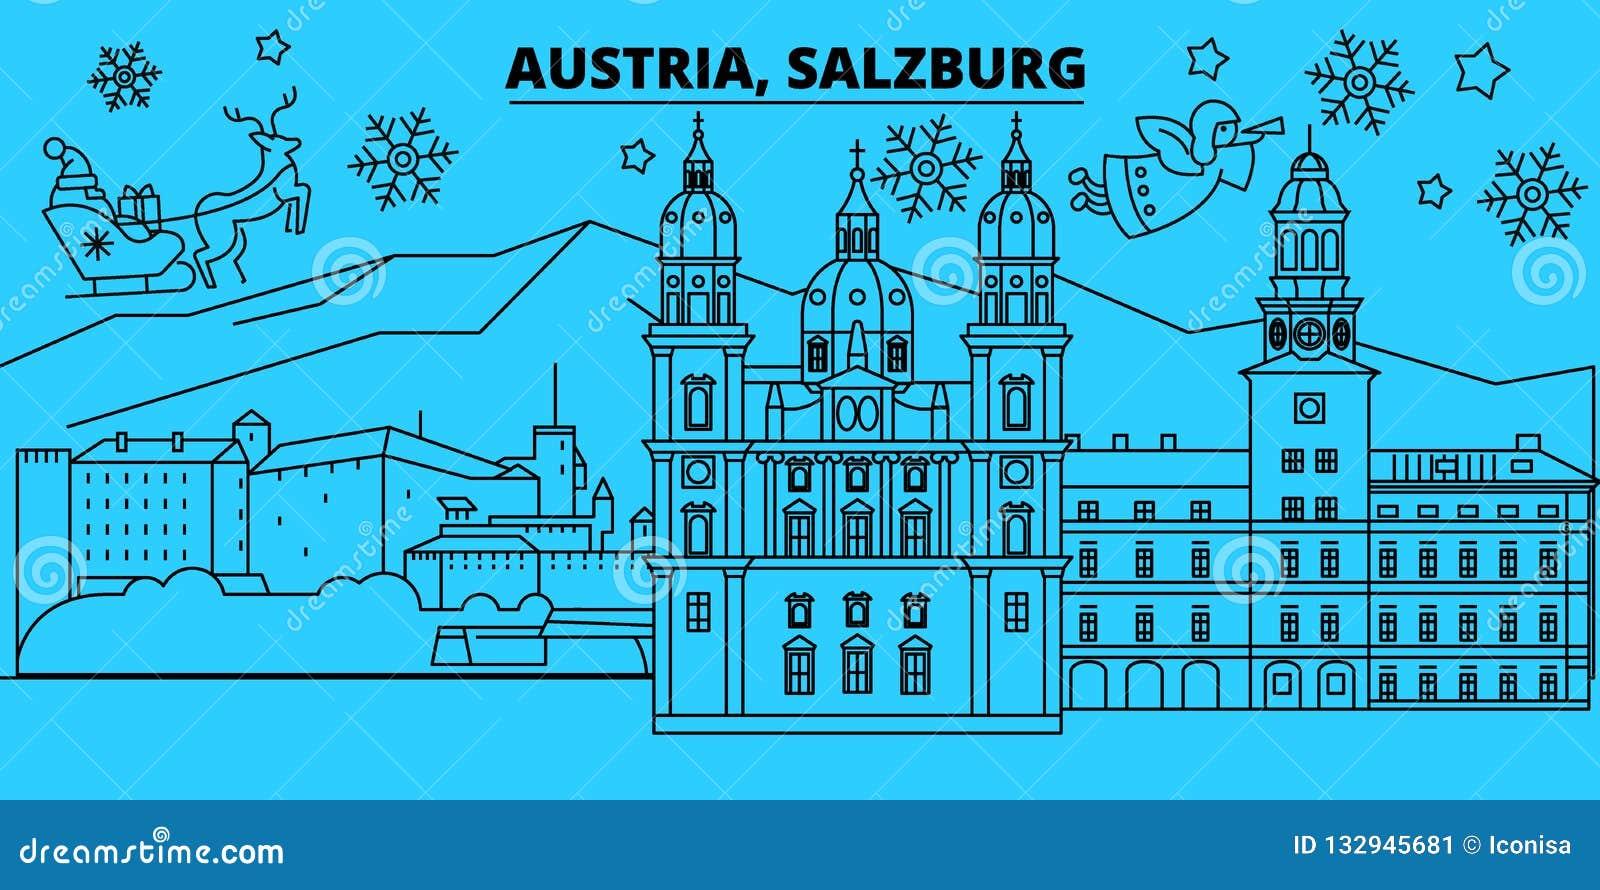 Christmas In Austria Holidays.Austria Salzburg Winter Holidays Skyline Merry Christmas